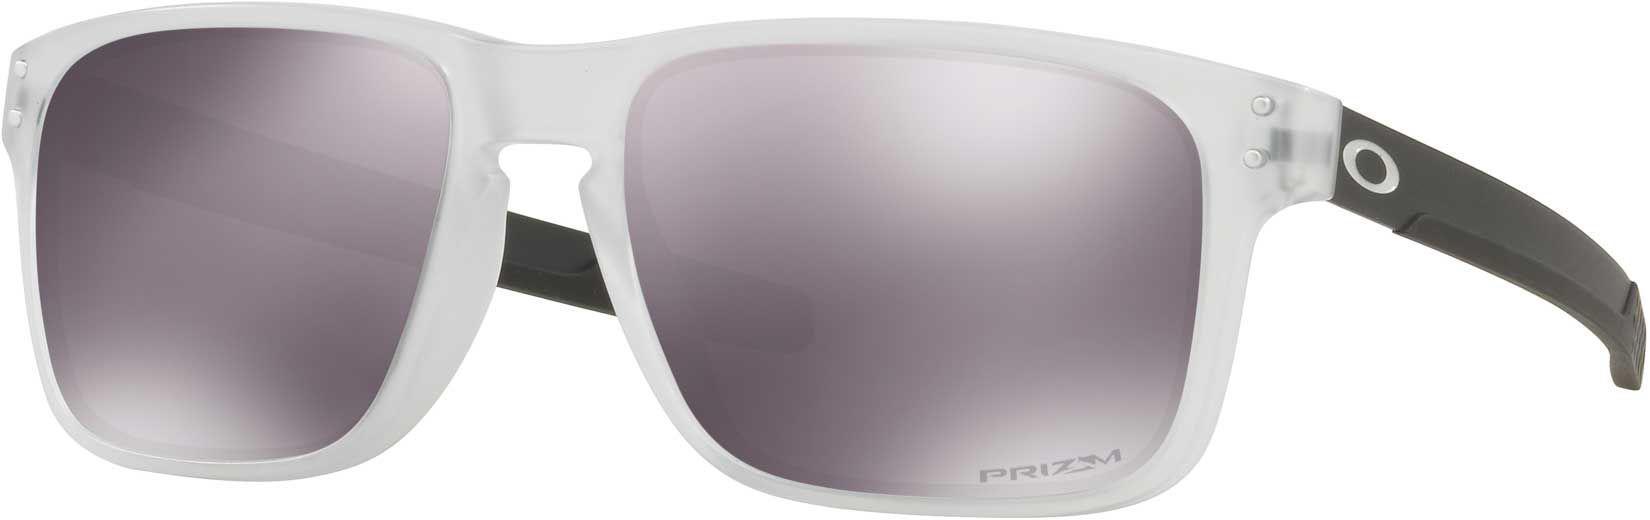 756b621a496 Lyst - Oakley Holbrook Mix Sunglasses in Purple for Men